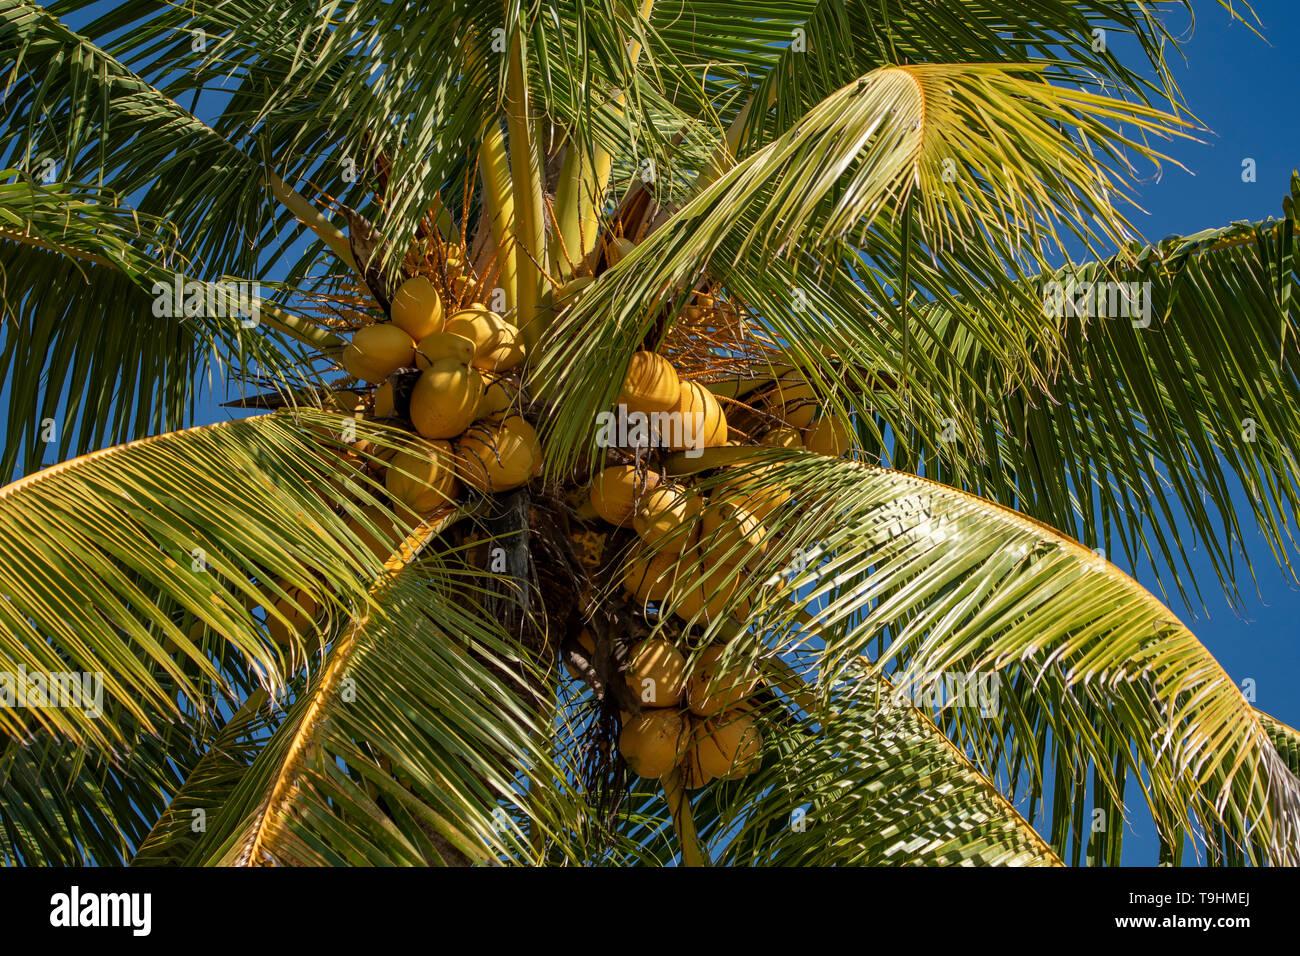 Cocos nucifera, Coconut Palm on Dunk Island - Stock Image